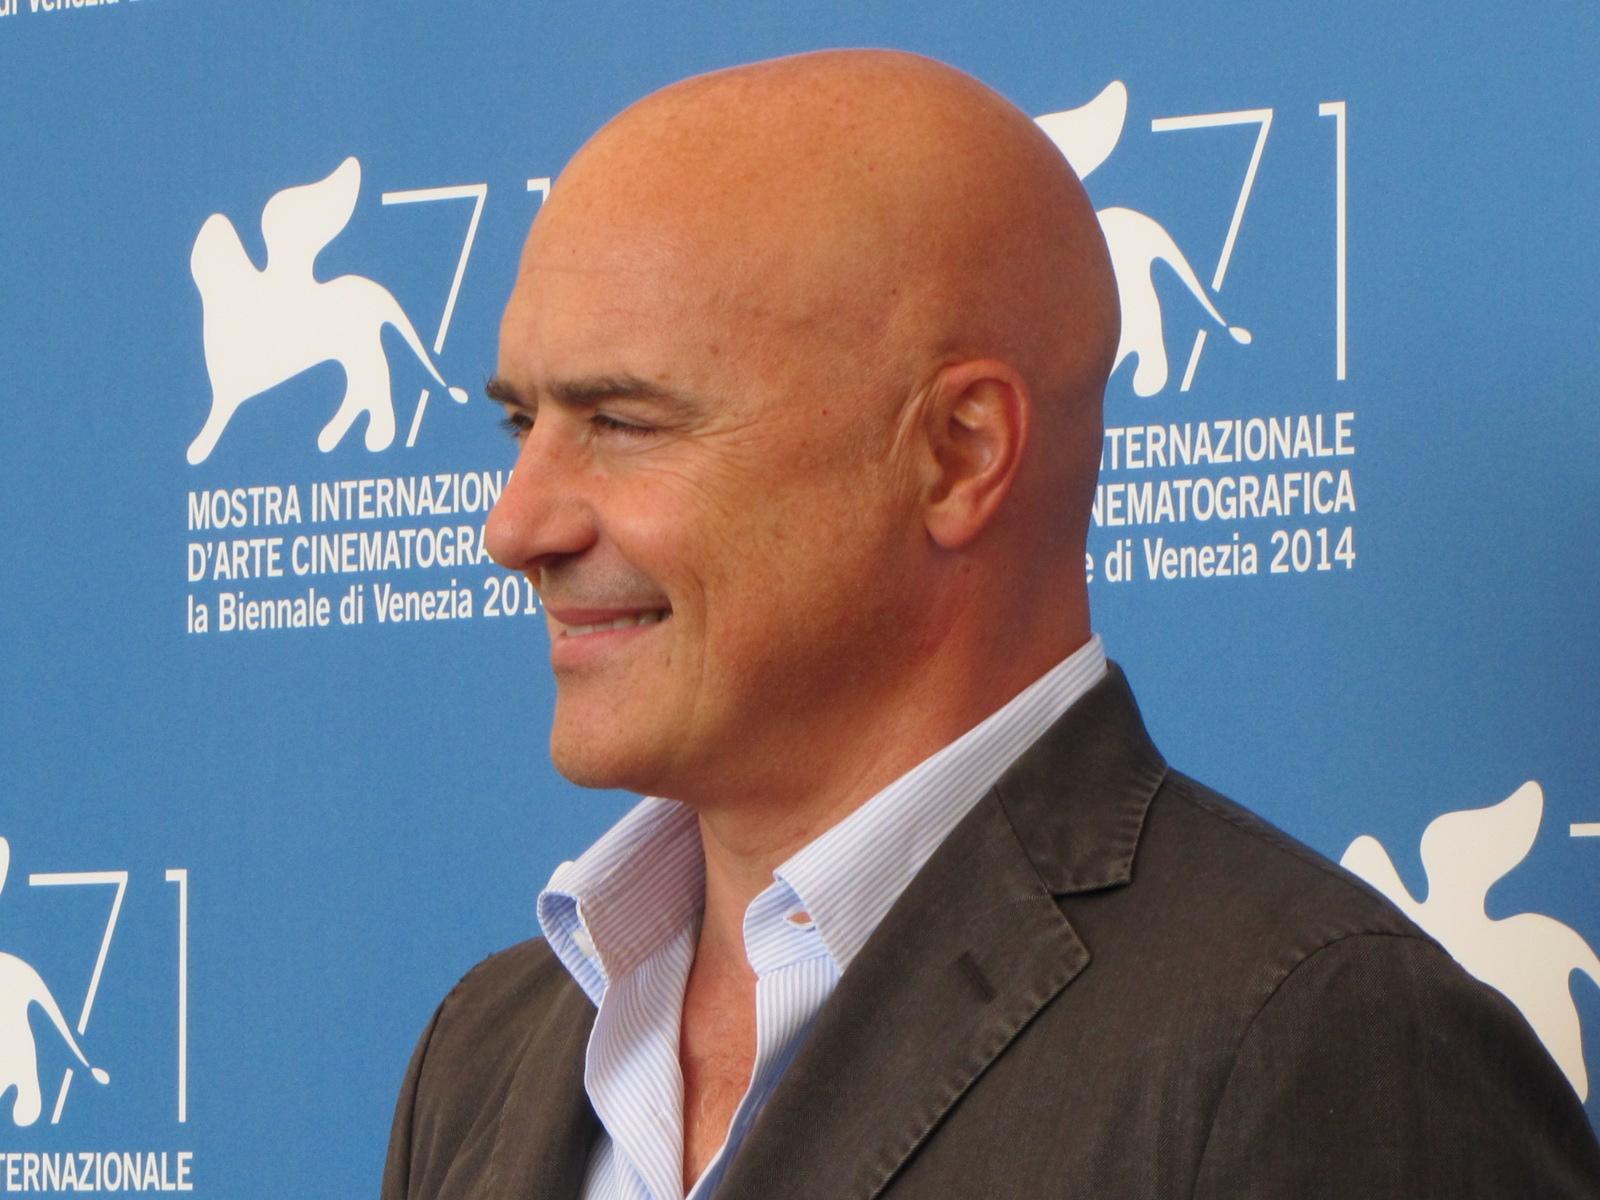 'Perez' a Venezia 2014 - Luca Zingaretti